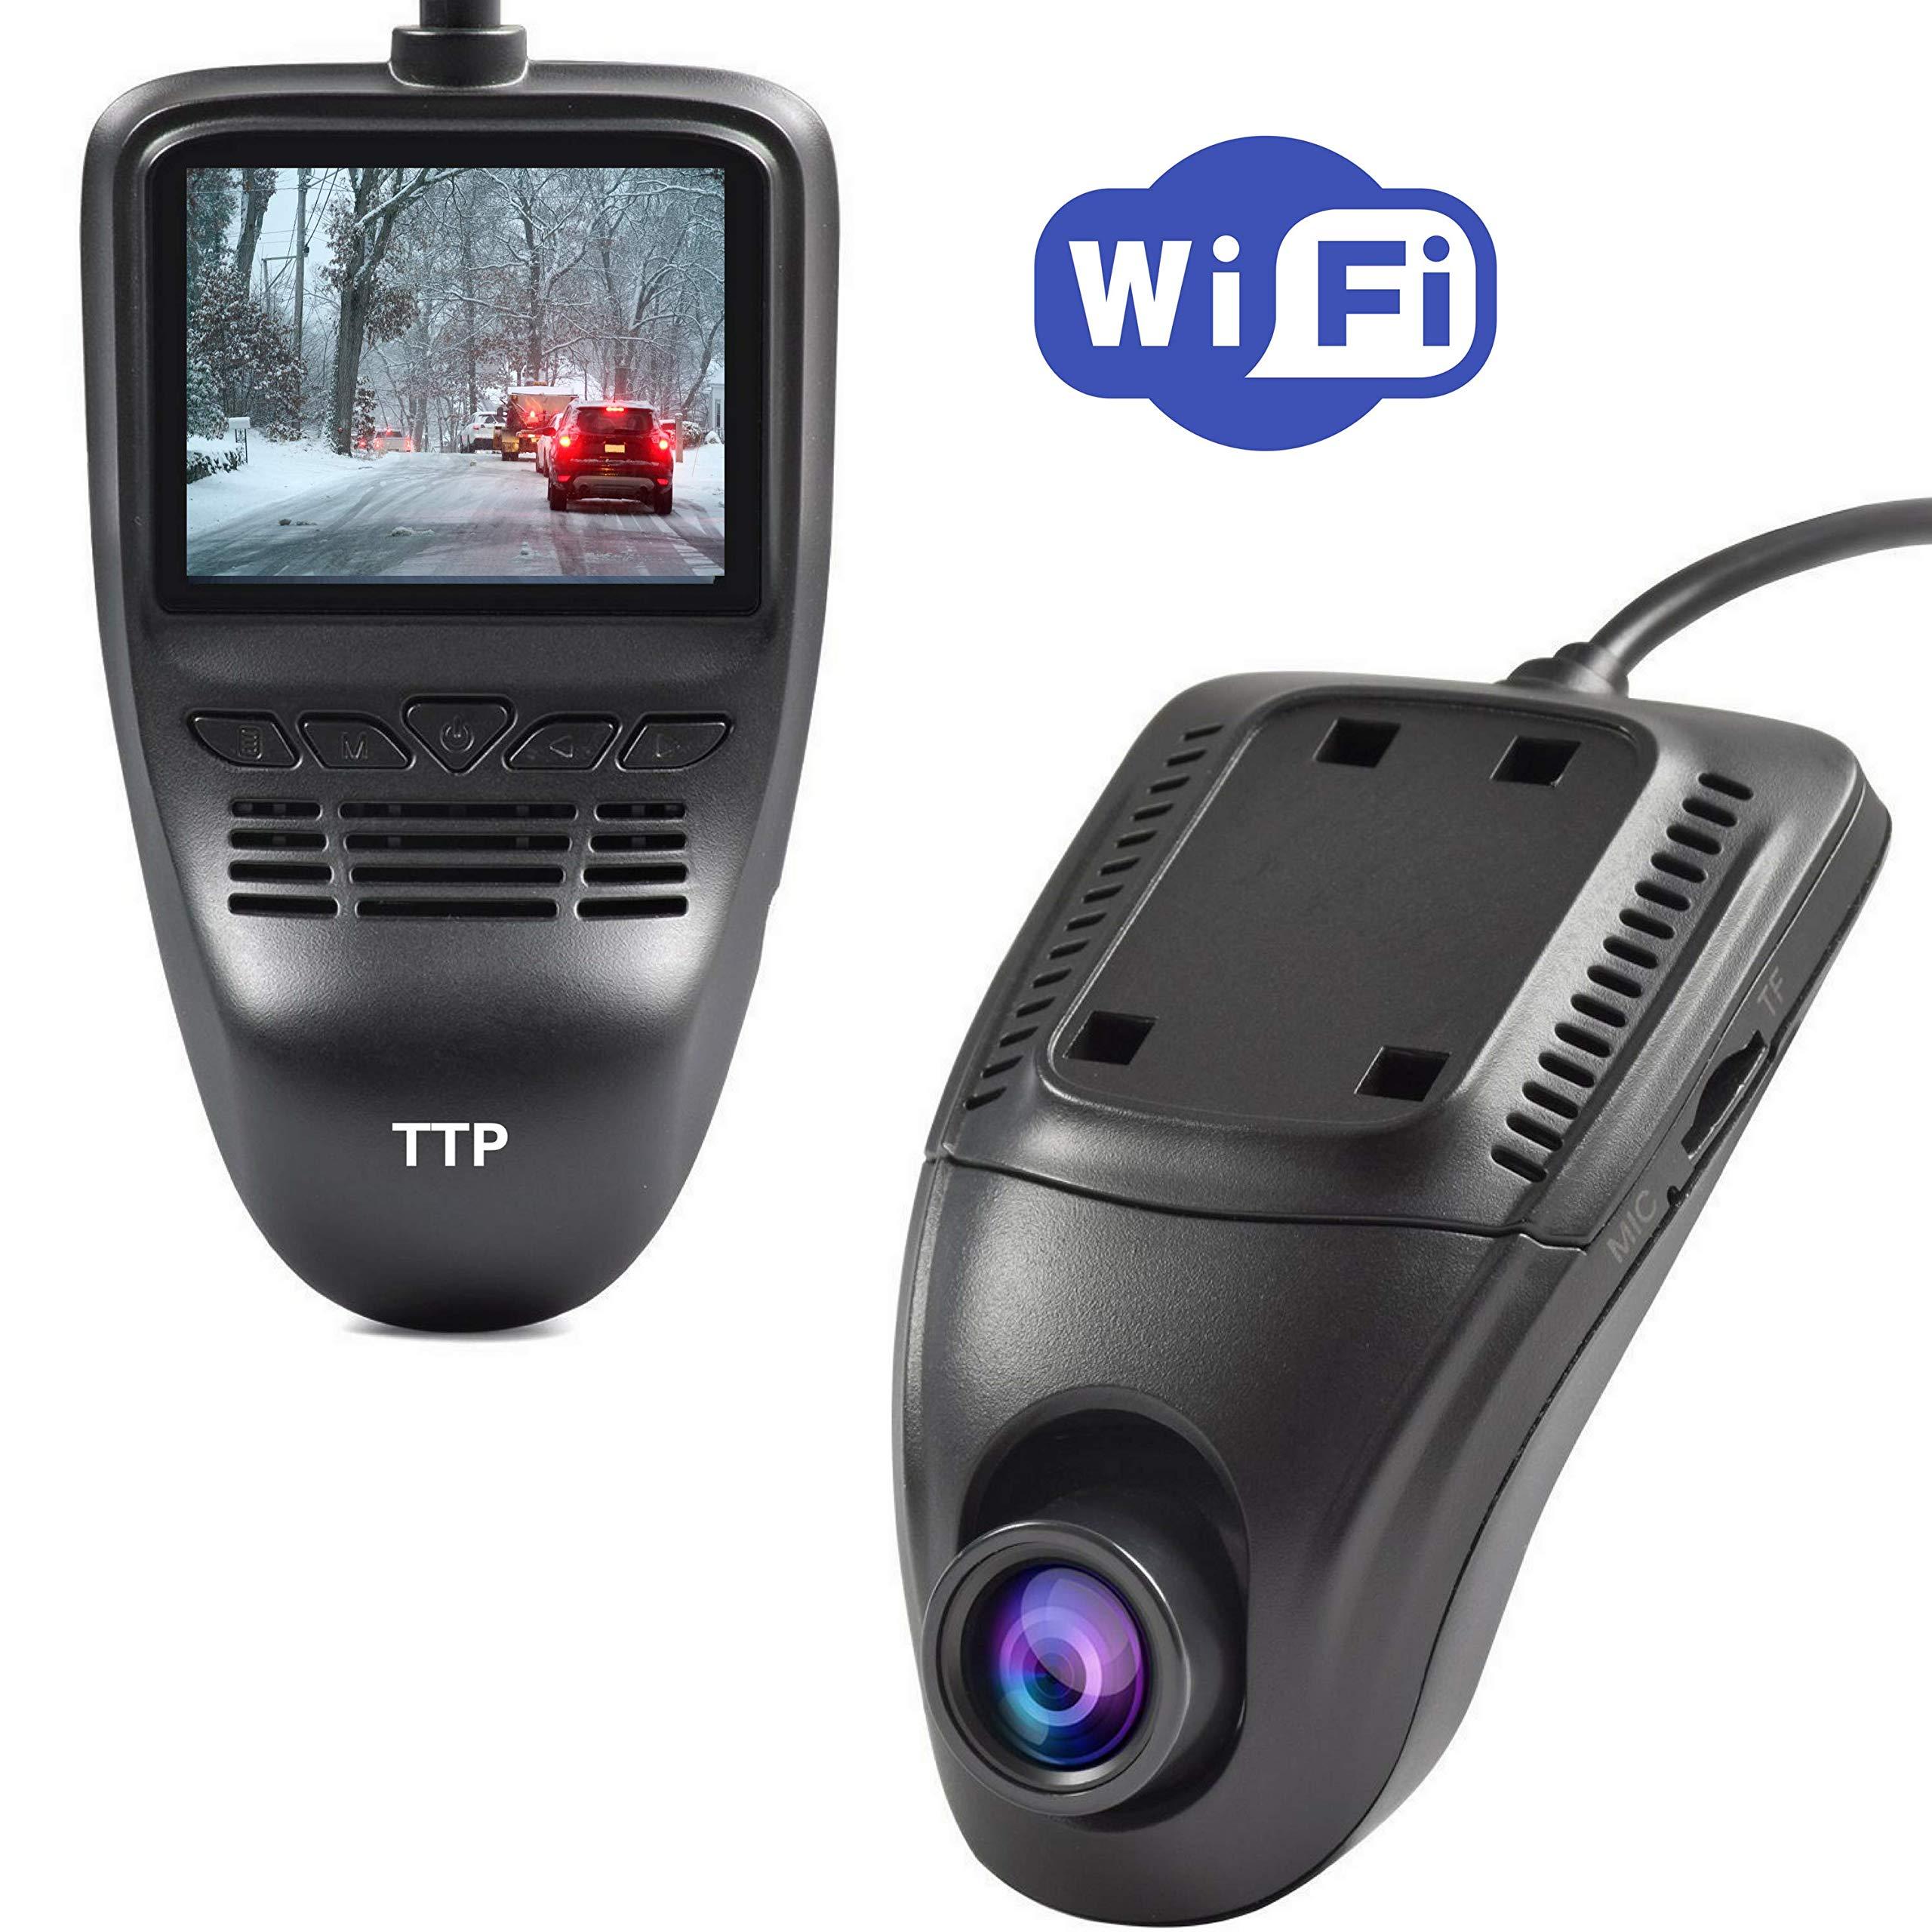 Driving Dash Cam Pro Camera, Car Front Dash Recorder Camera 4 Lanes,Driving Dvr Cam with WiFi,Sony Cmos Video Sensor,Loop Recording,G-Sensor,Invisible Design